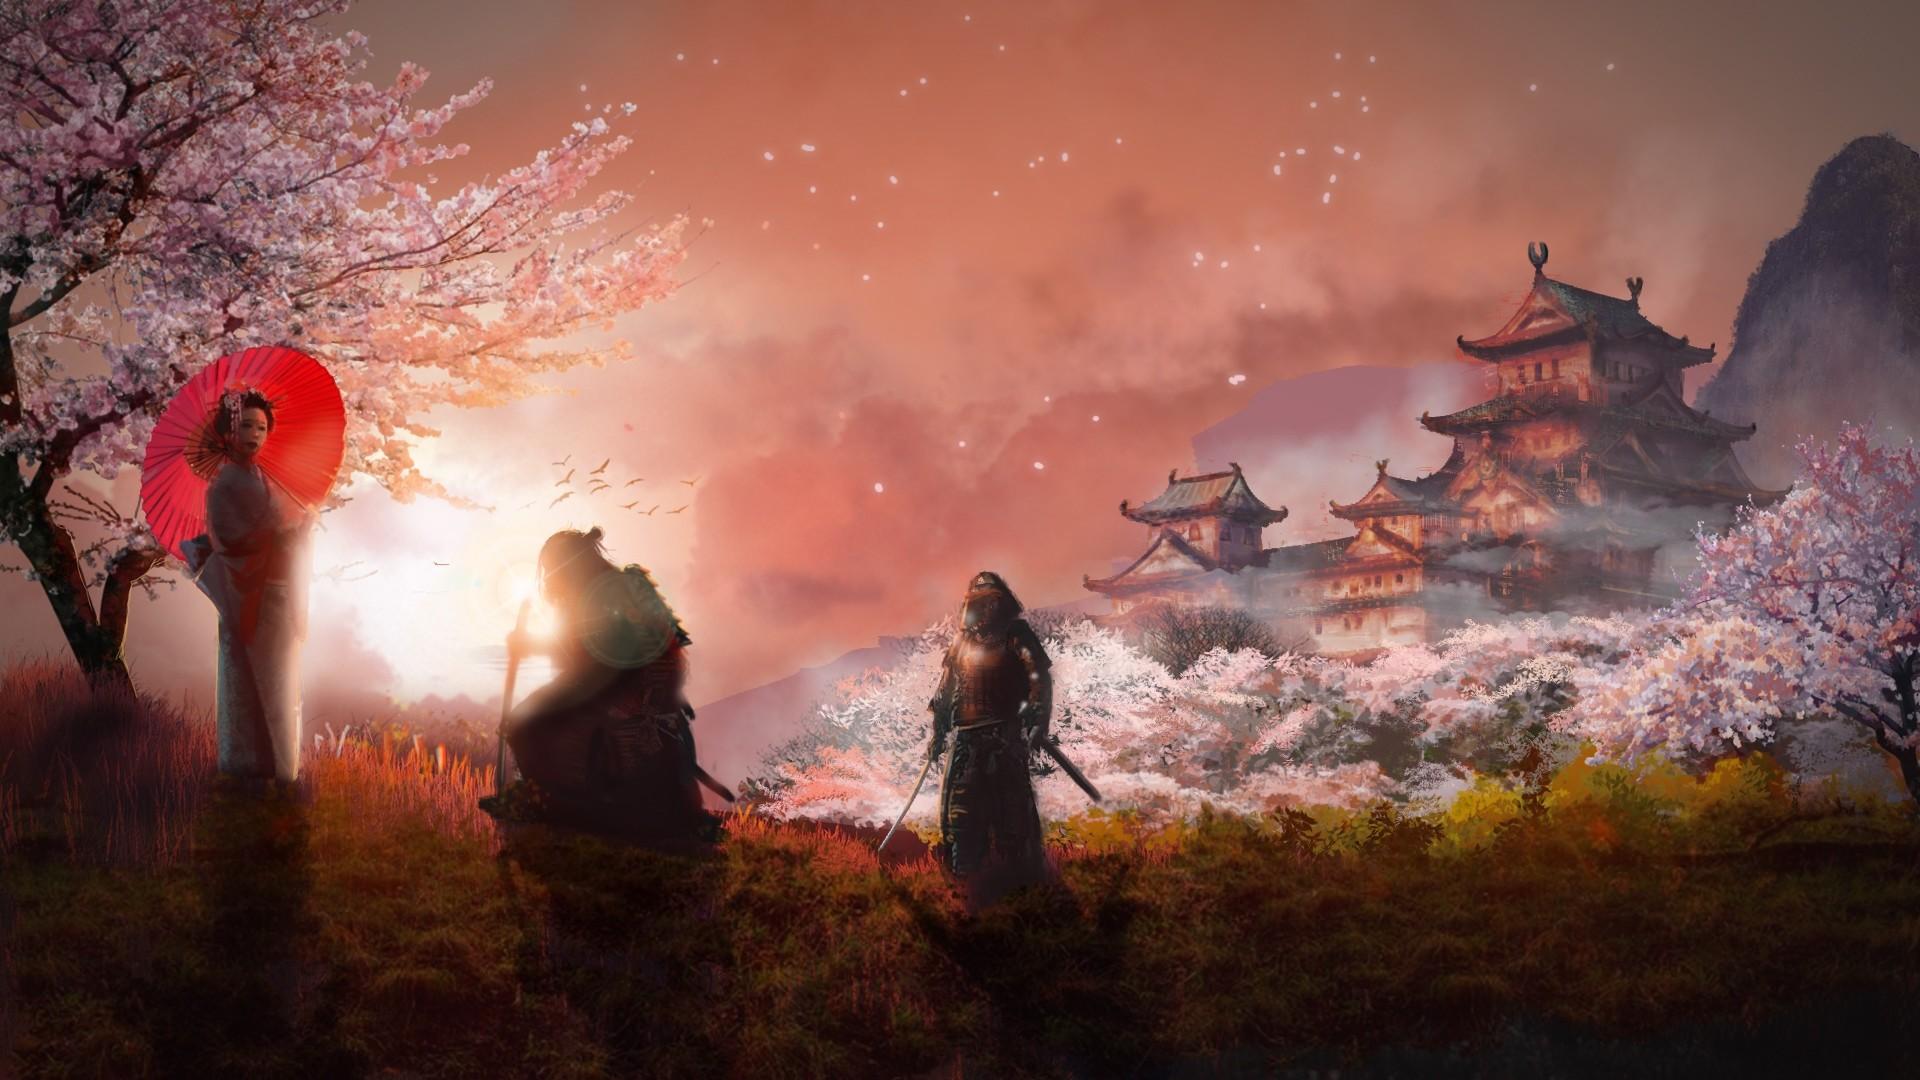 Samurai PC Wallpaper